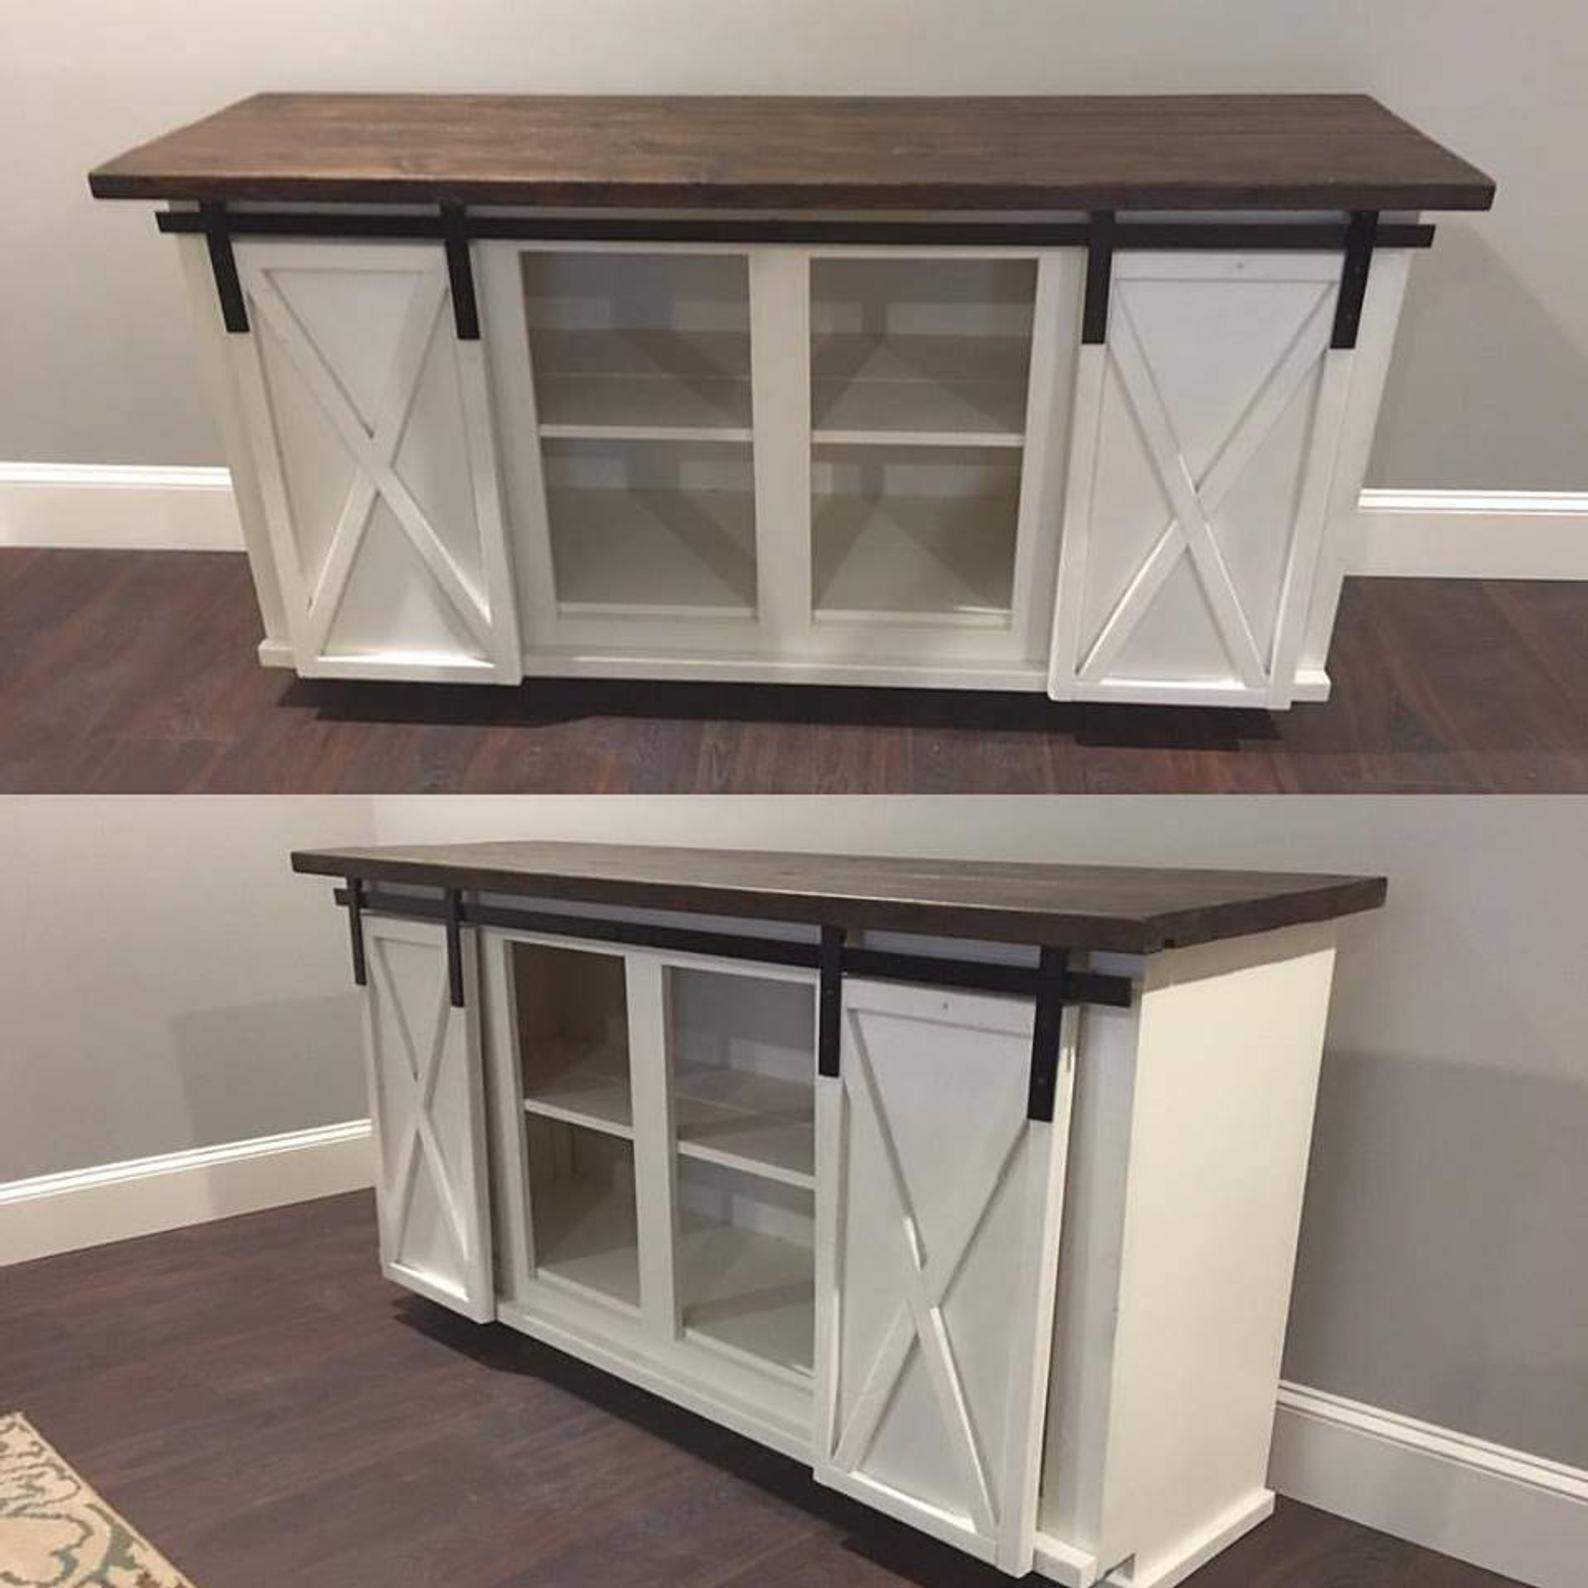 Custom Sliding Barn Door Bar Cabinet In 2019 Storage with regard to proportions 1588 X 1588